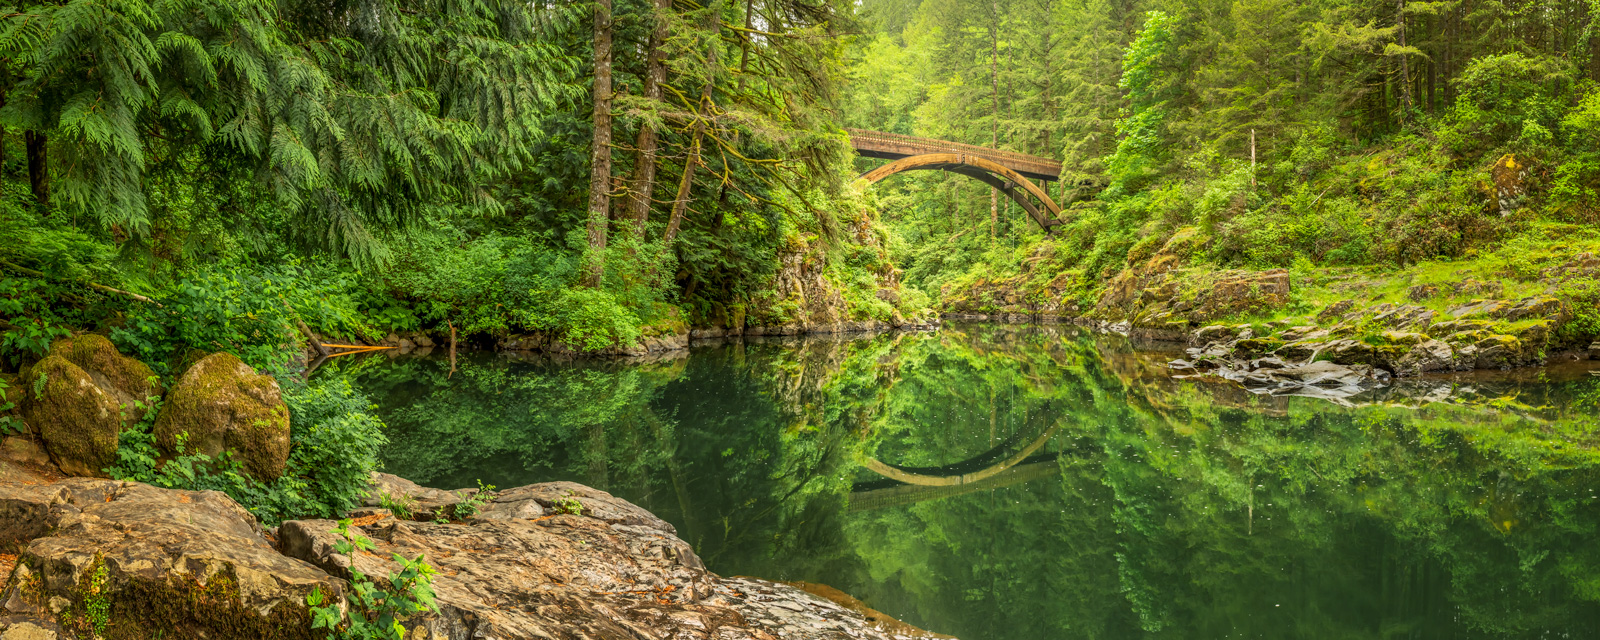 Washington, Moulton Park, Footbridge, reflection, Summer, Green, photo